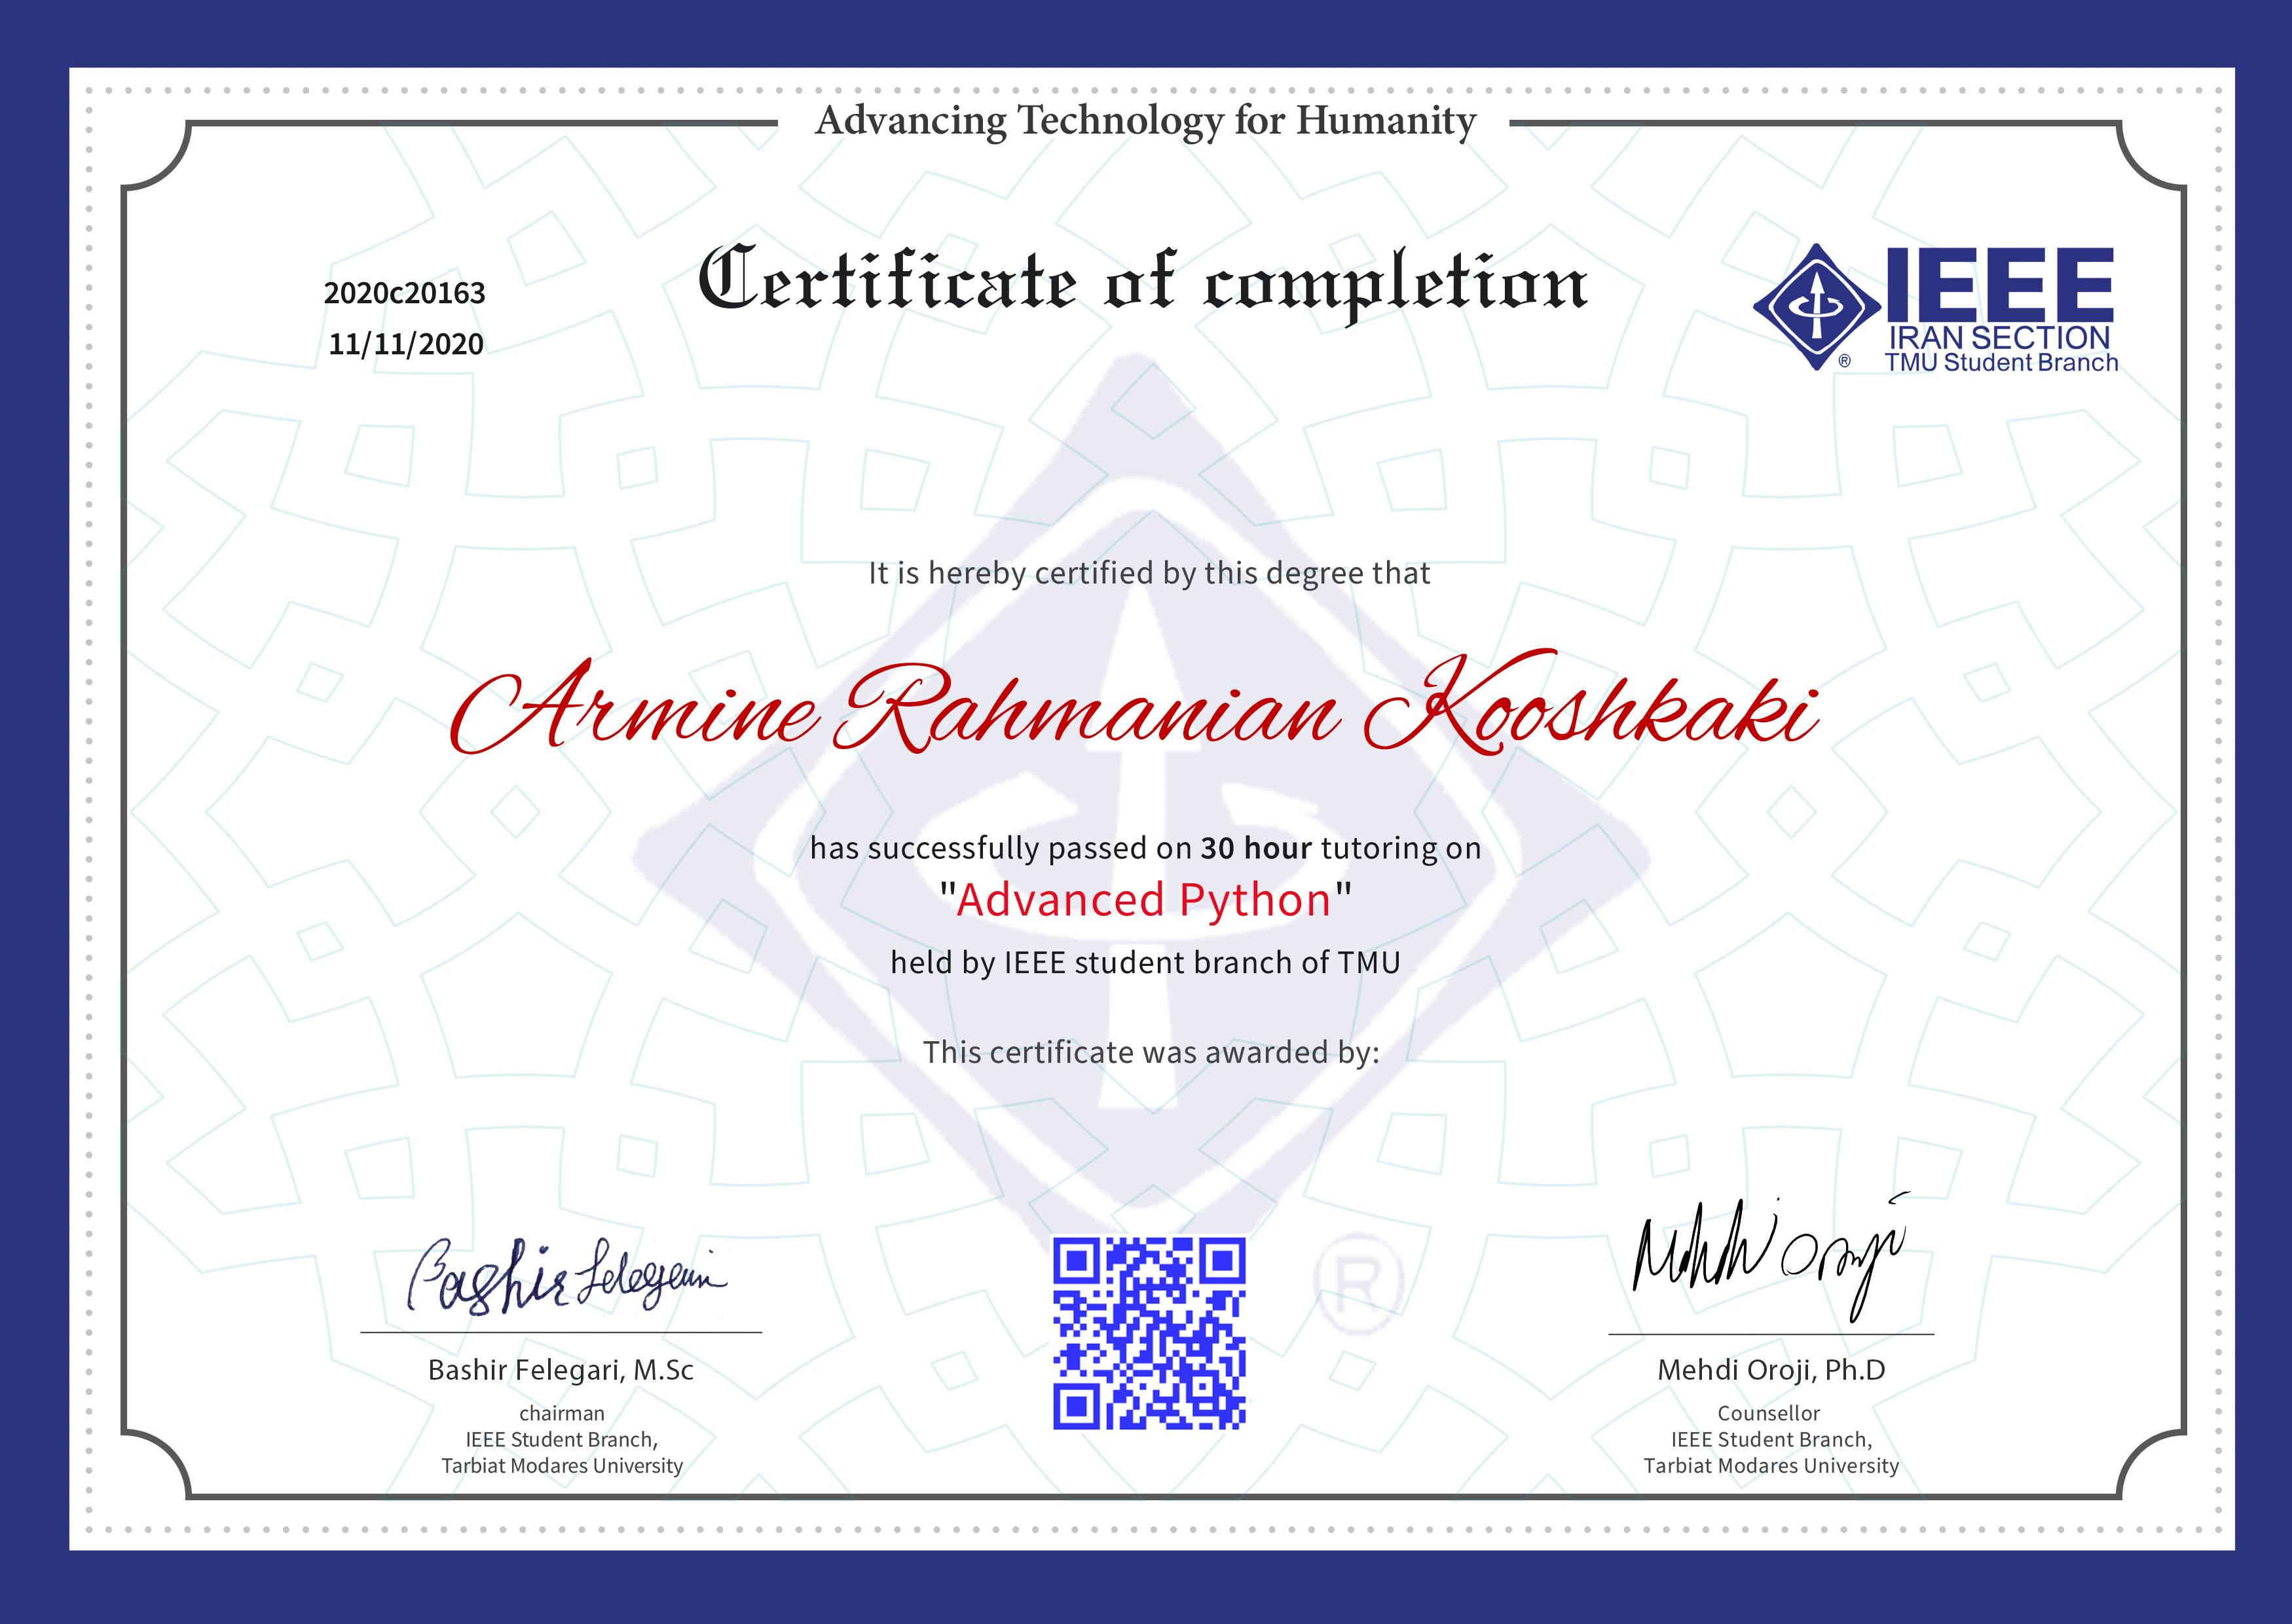 Armine Rahmanian Kooshkaki